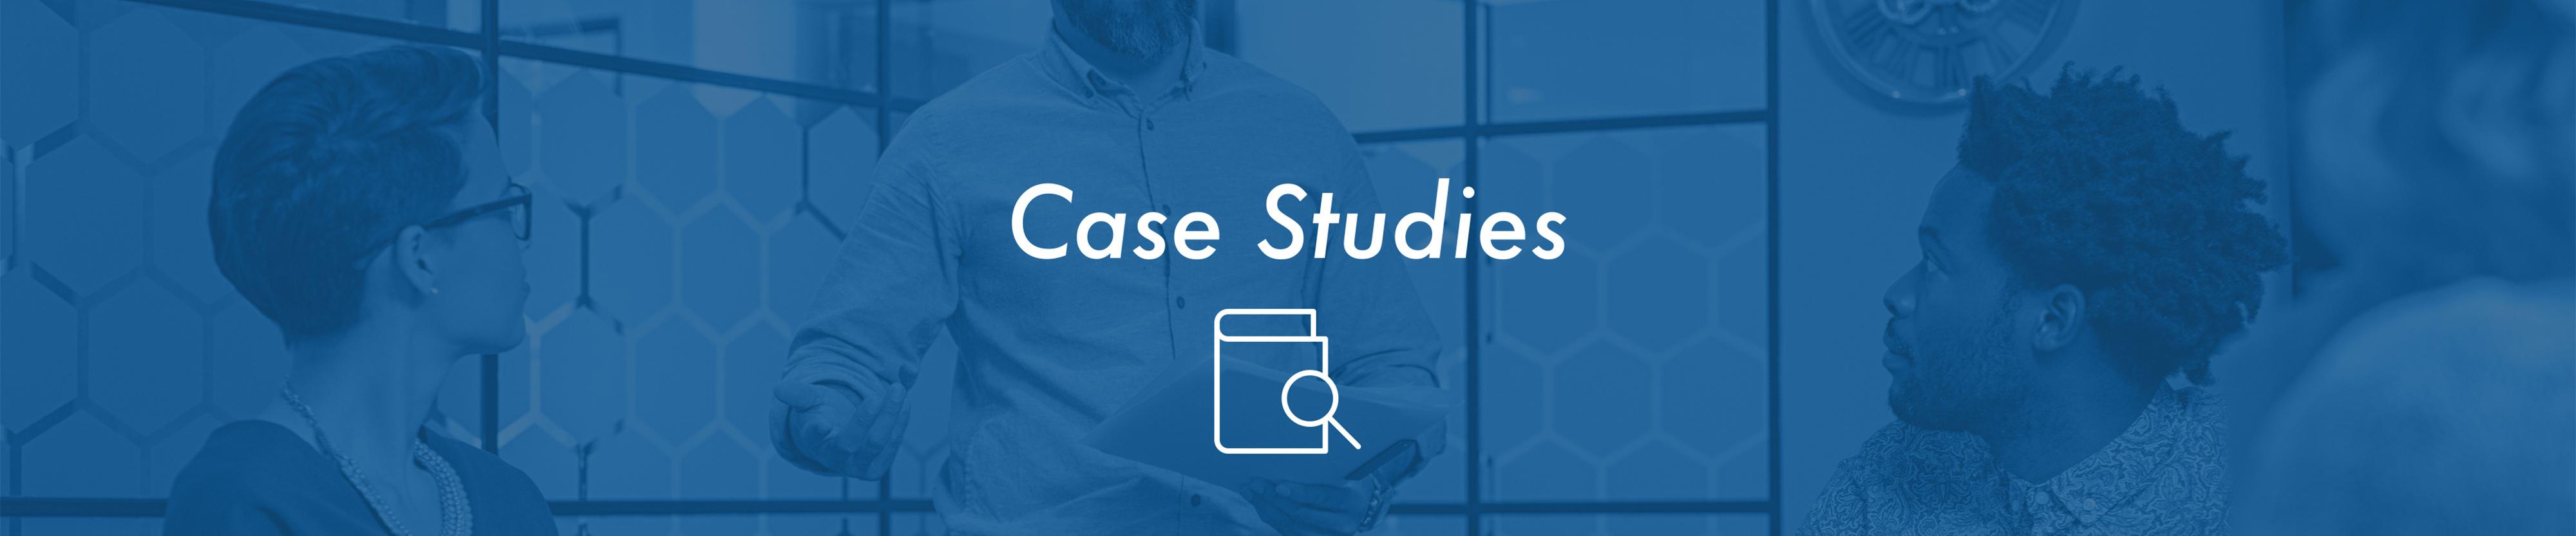 Advanced Analytics Group Case Studies Banner